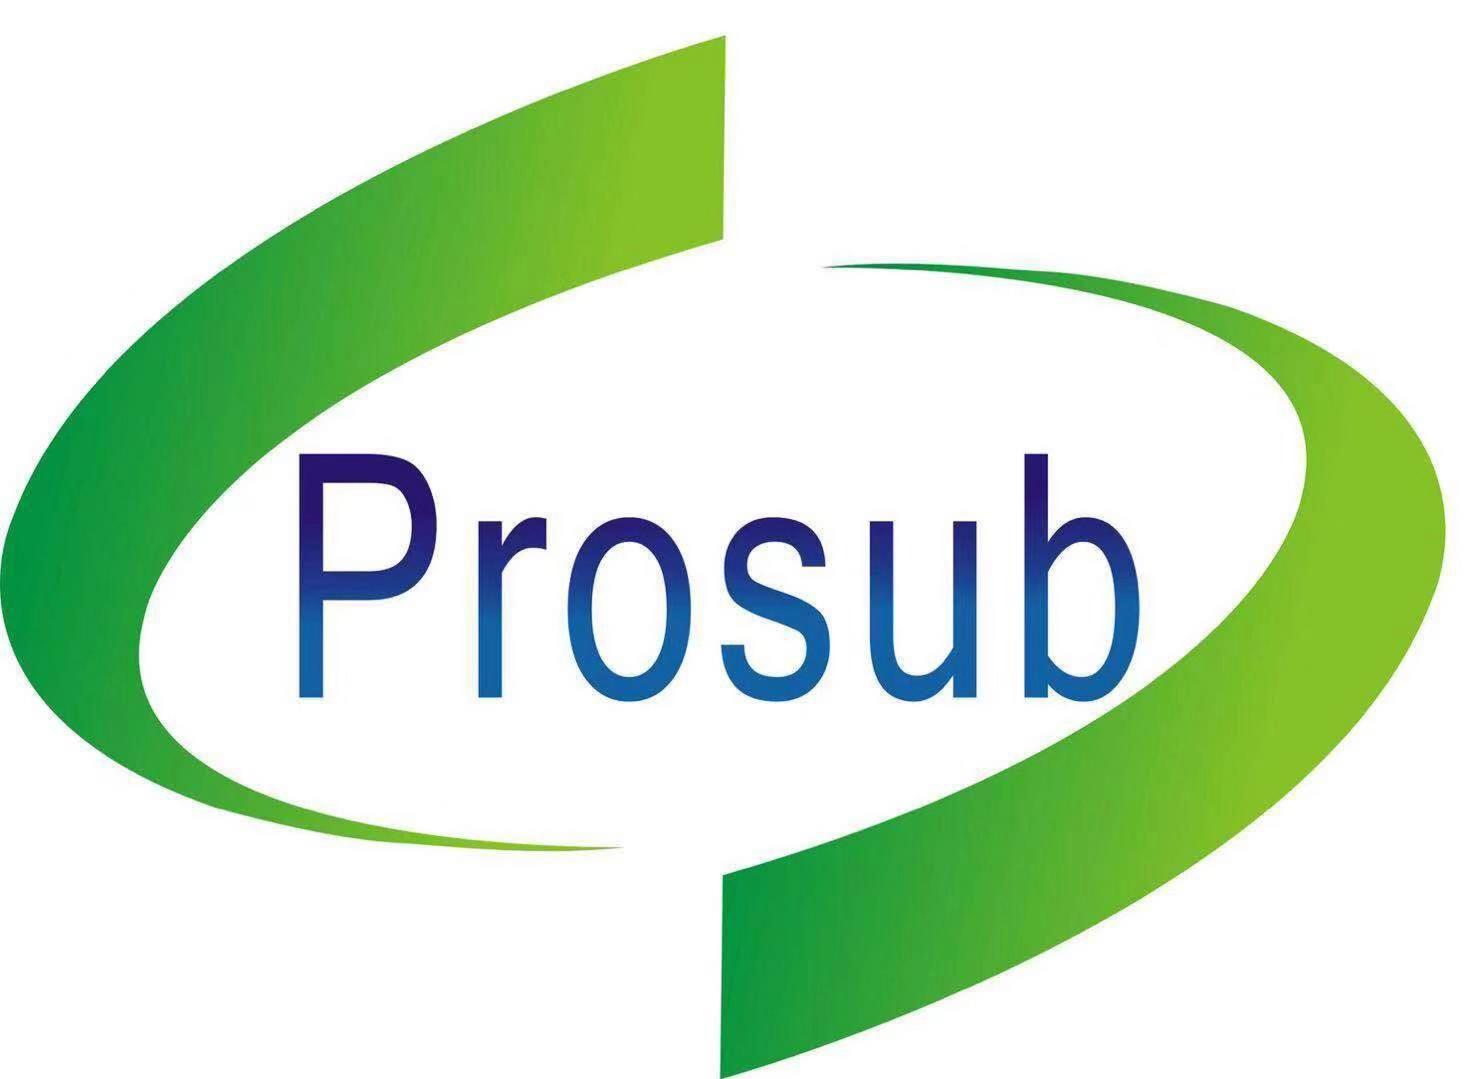 Dongguan Prosub technology co.,Ltd